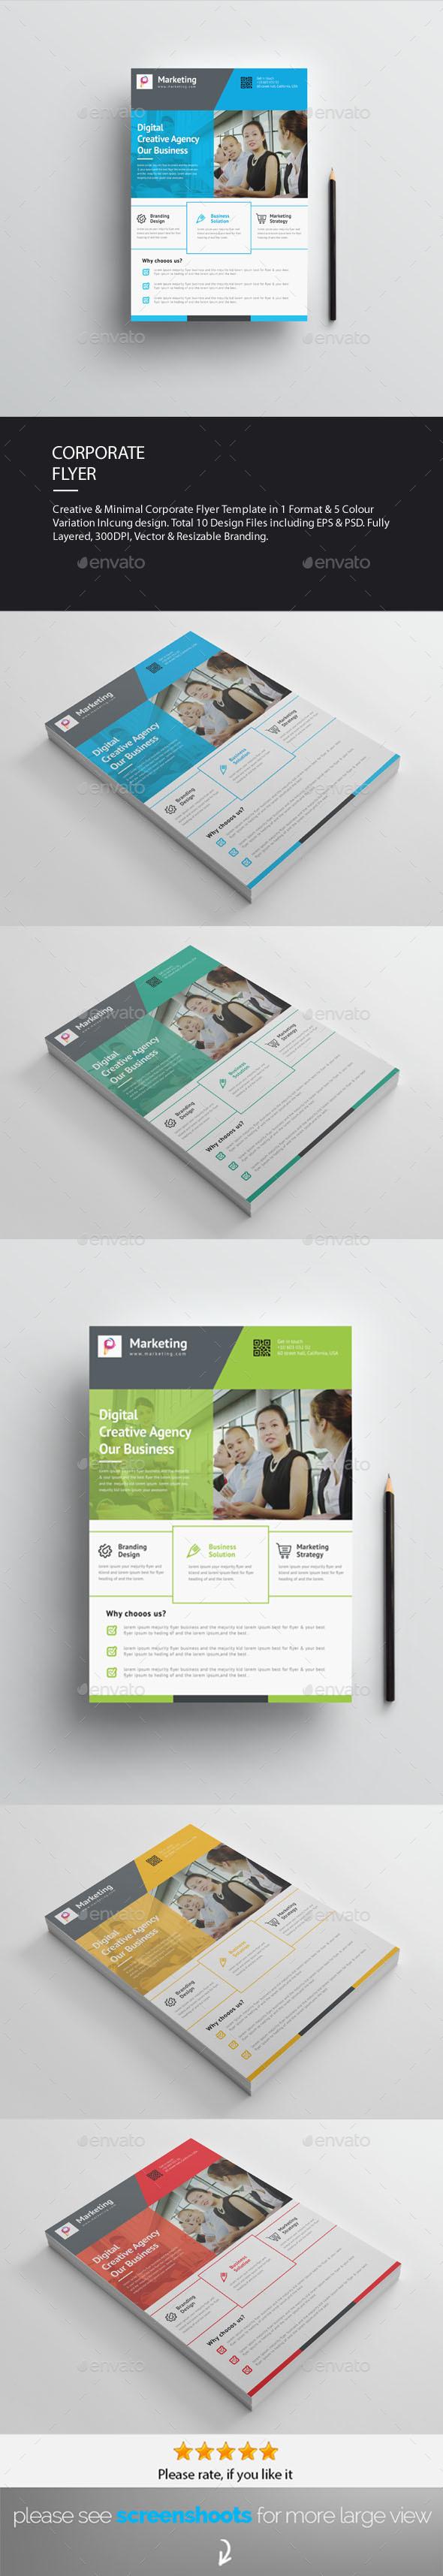 GraphicRiver Corporate Flyer 20463104